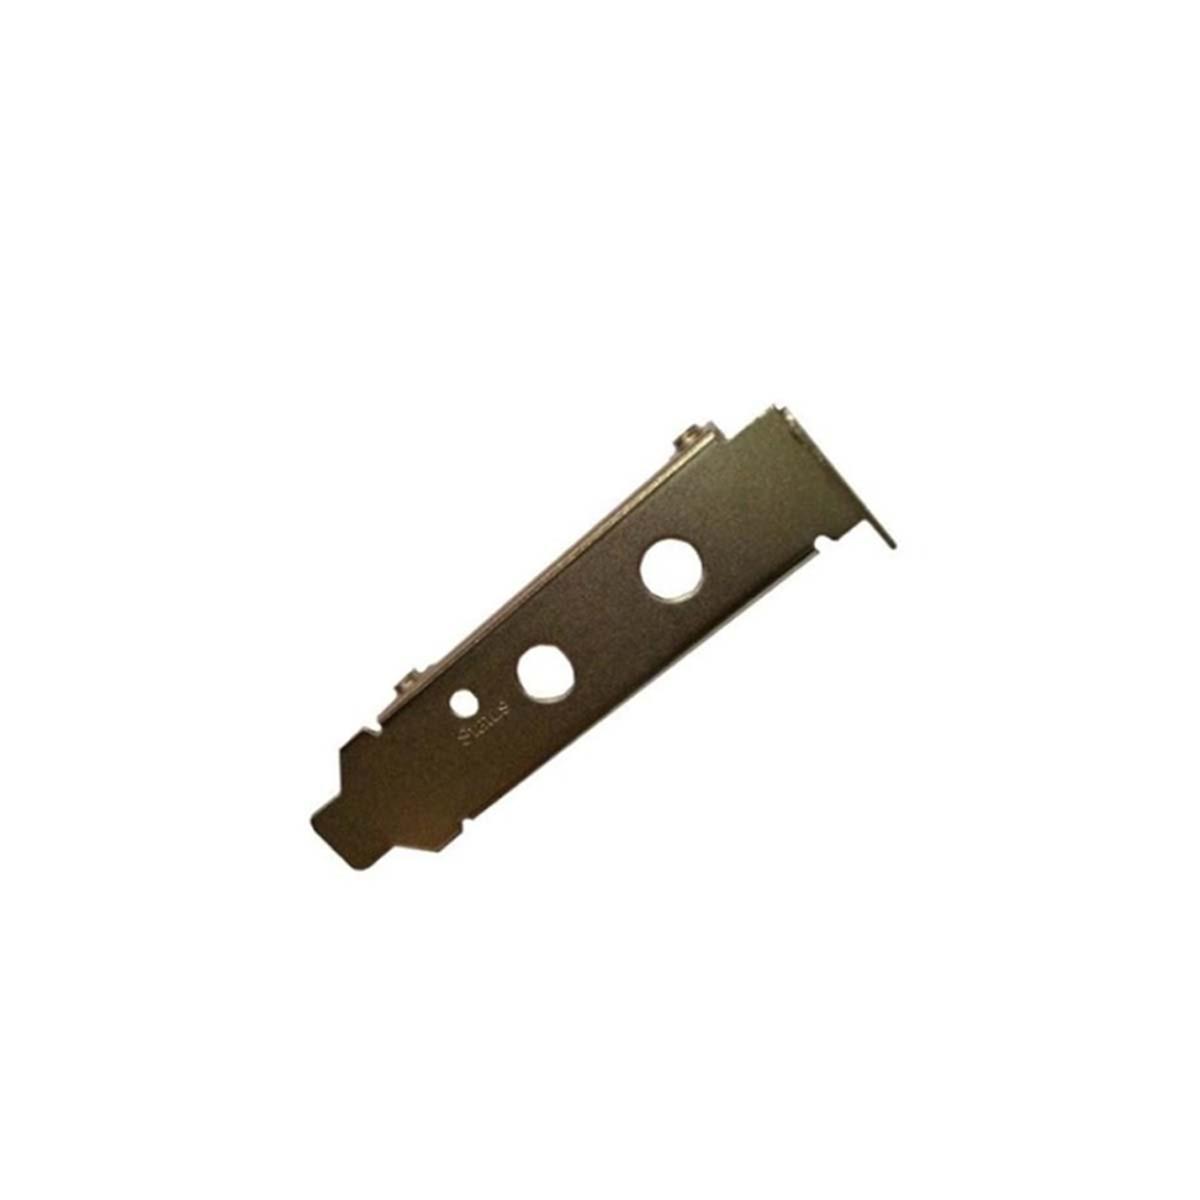 Aleta Low Profile para TL-T8E T9E | TP-LINK